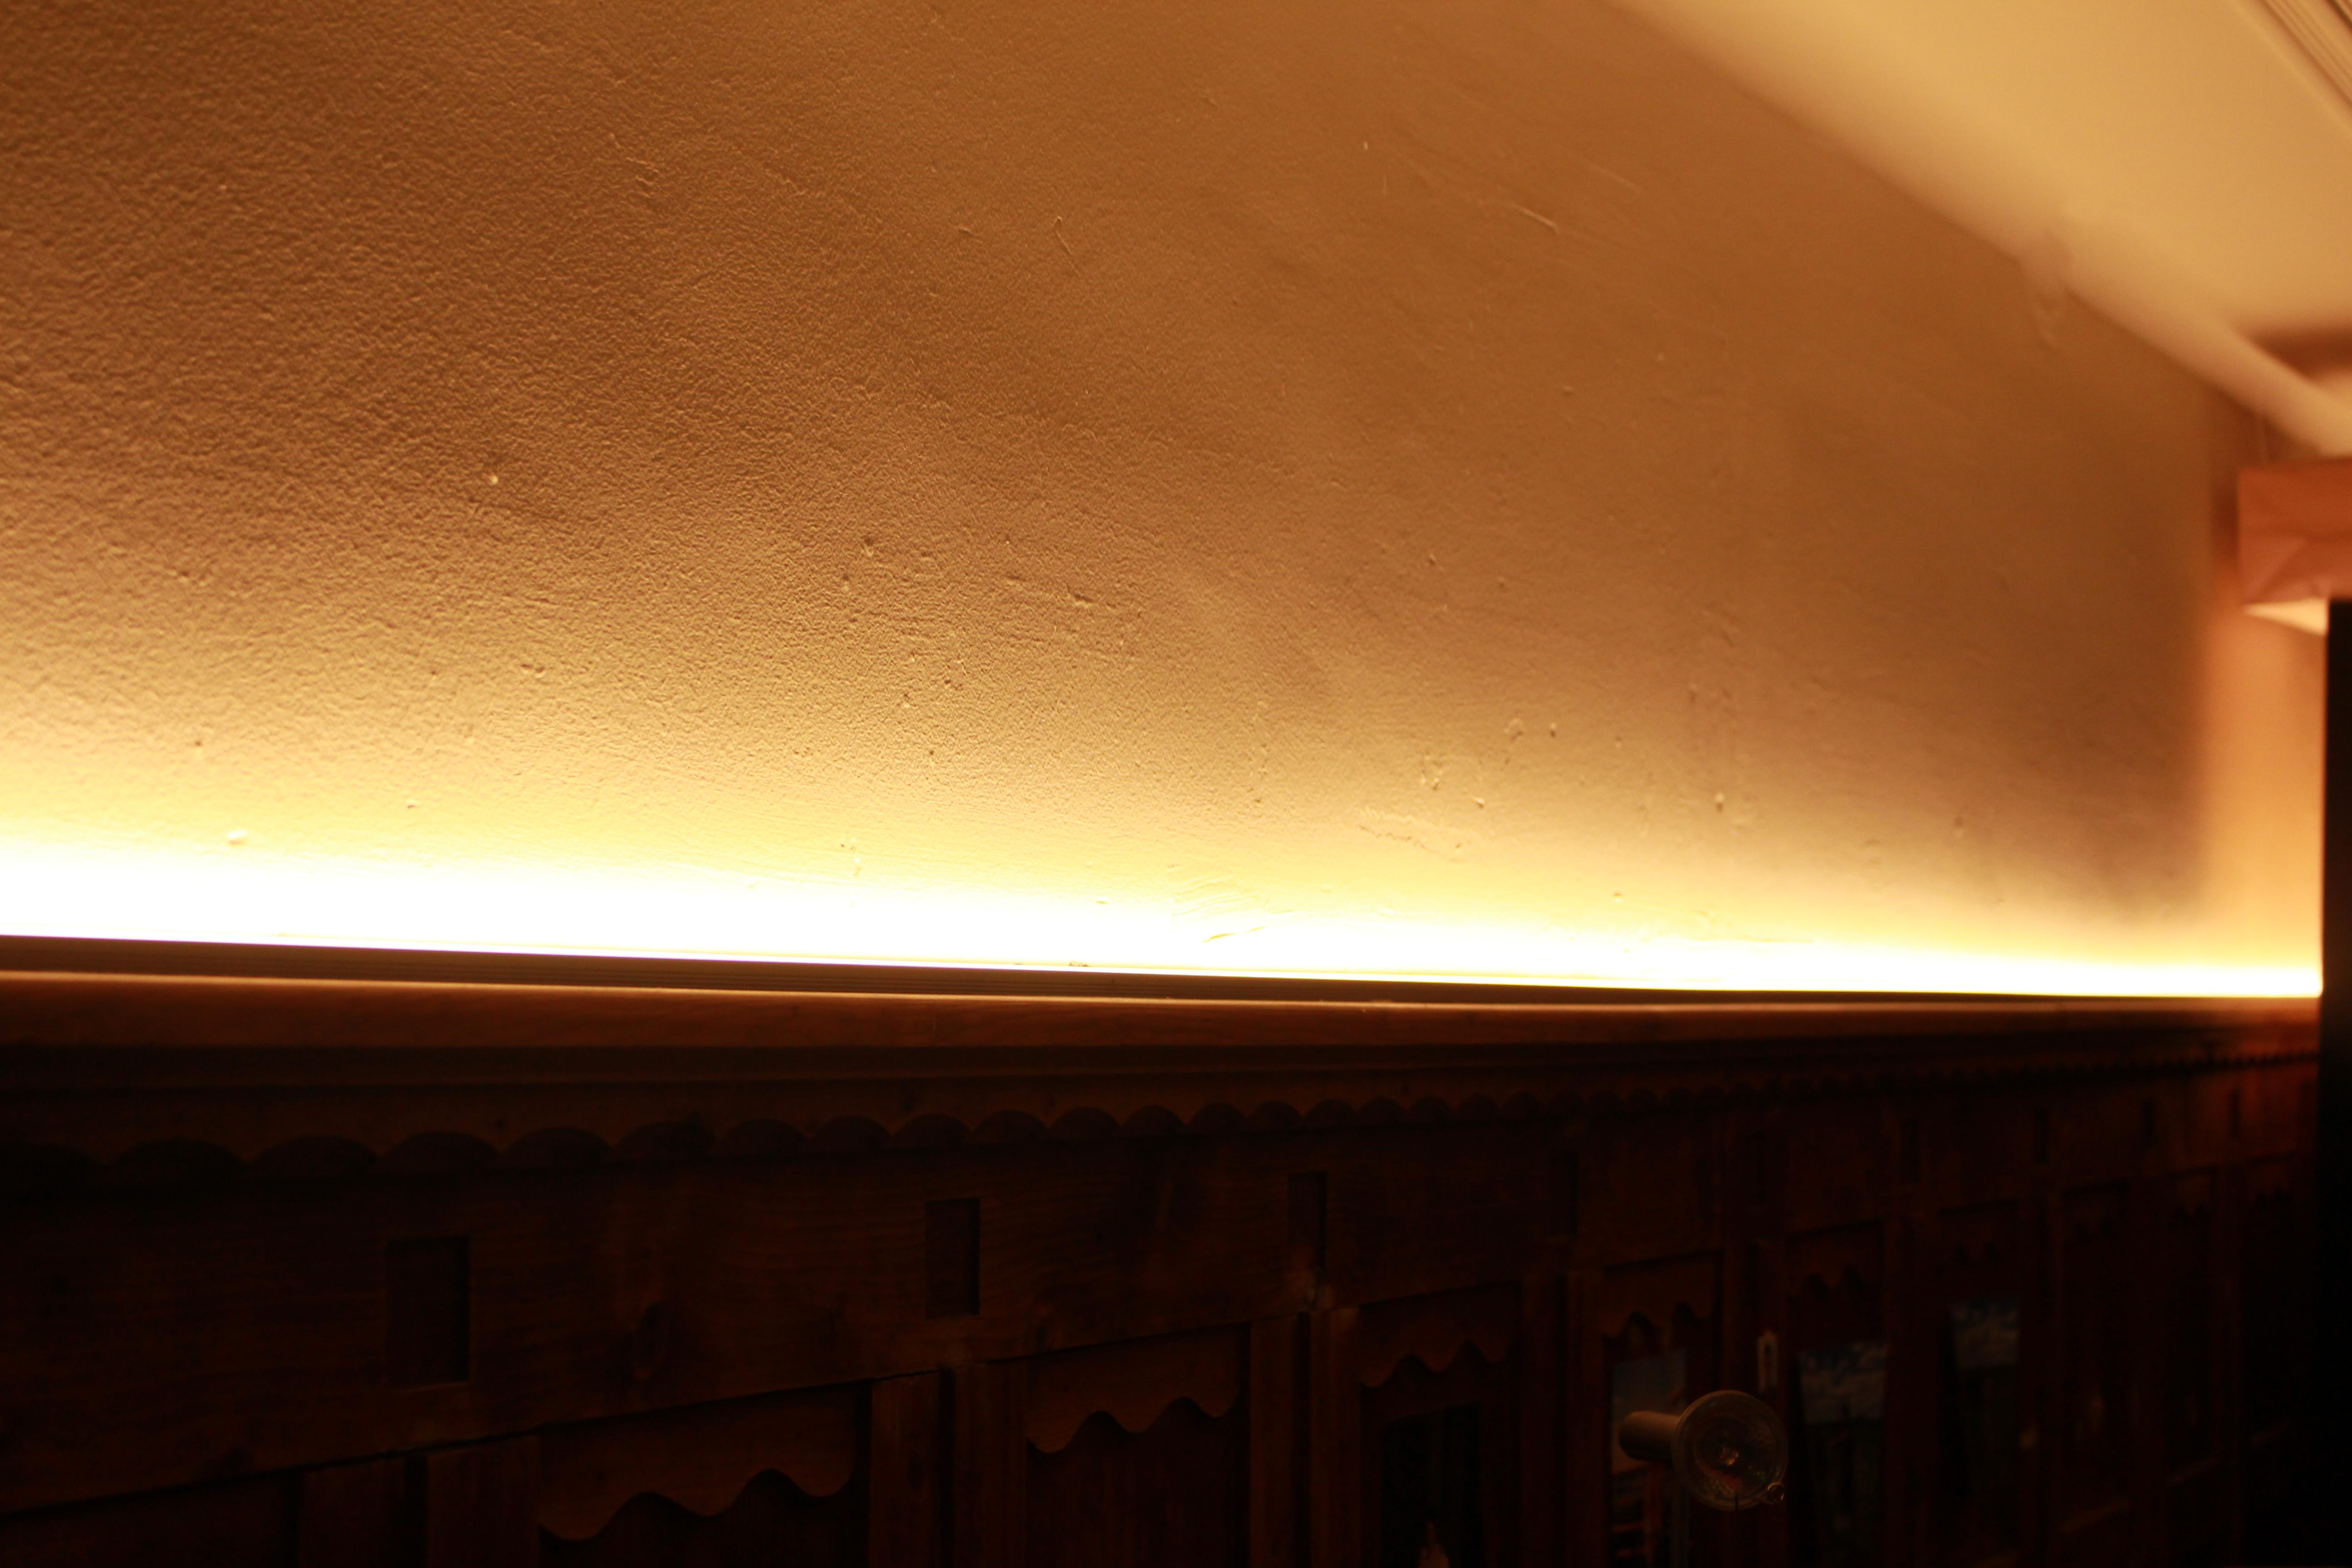 Unterbaubeleuchtung